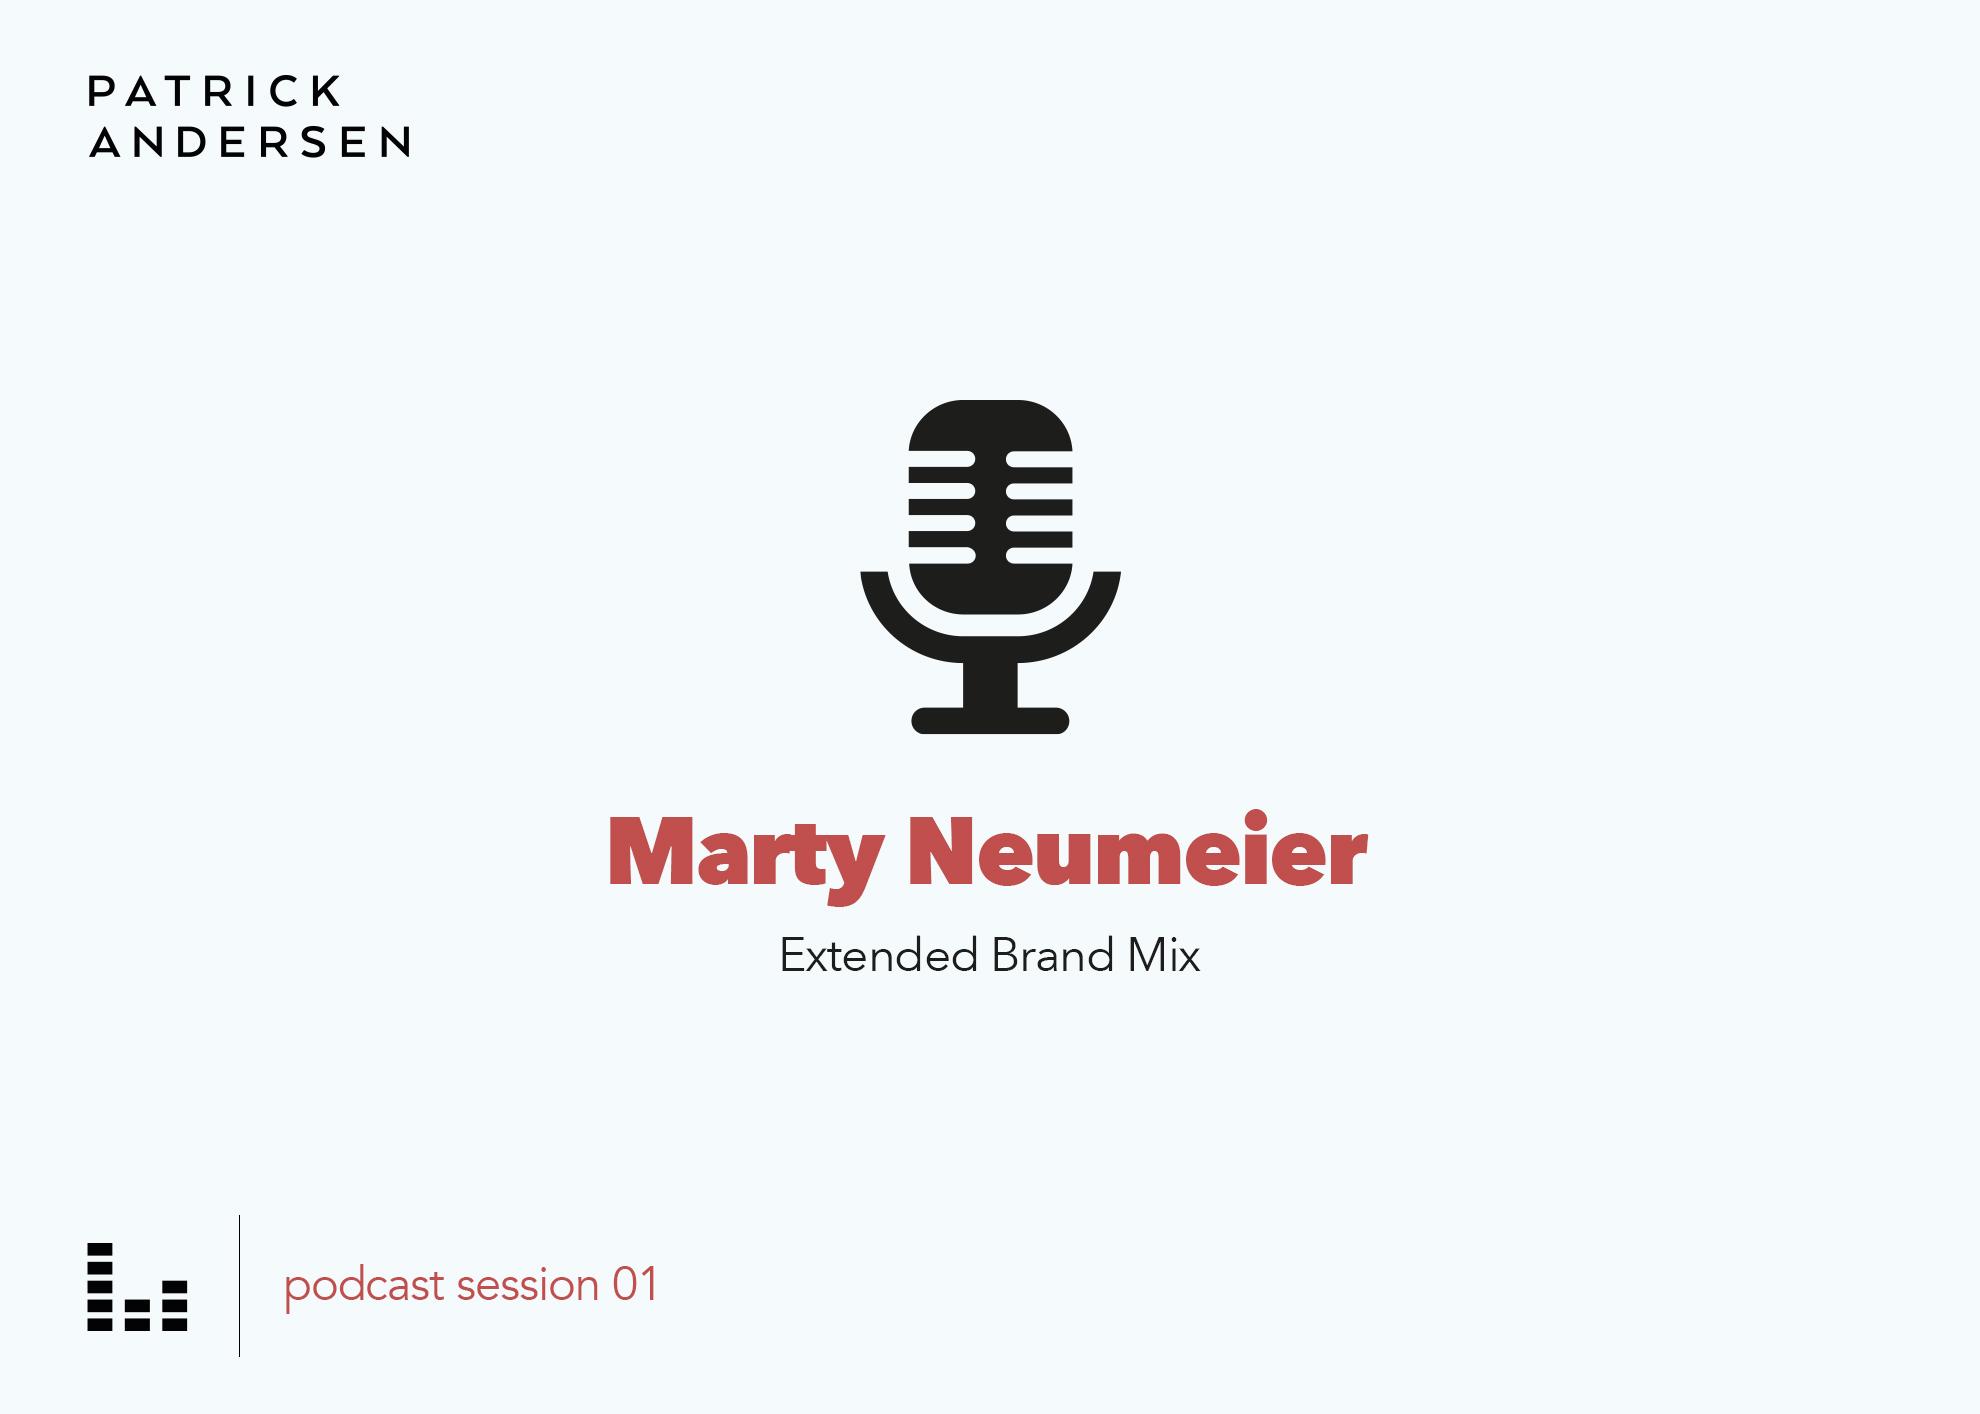 Patrick Andersen Podcast 01 Marty Neumeier